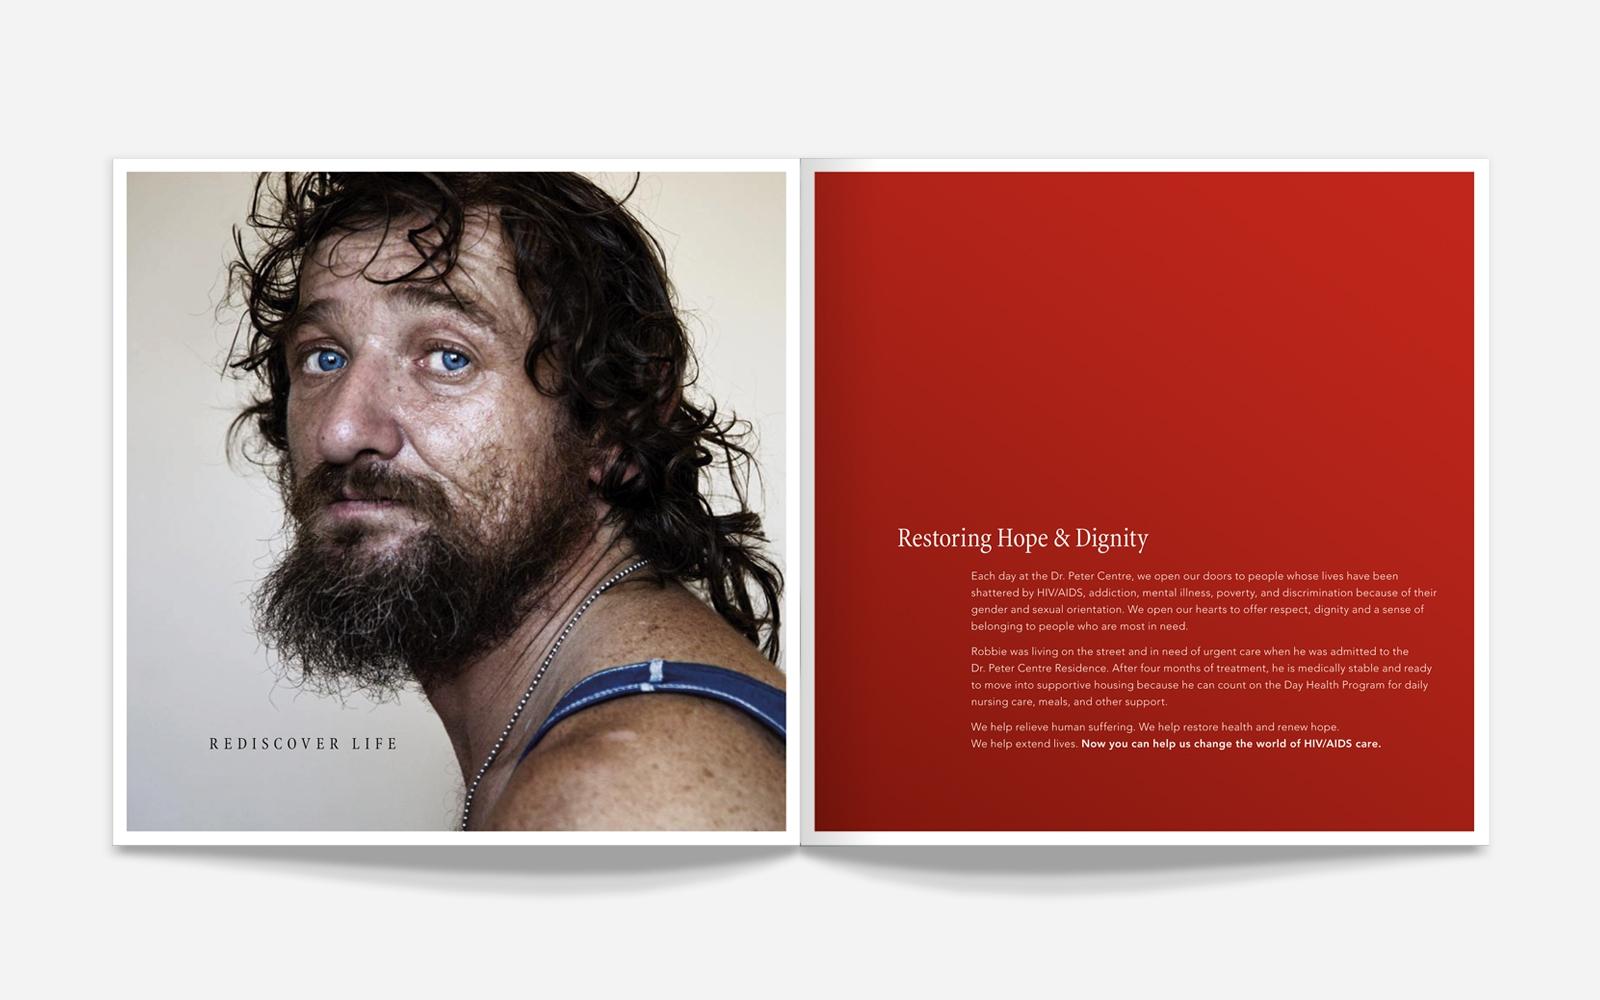 dr_peter_brochure-1600x1000.jpg